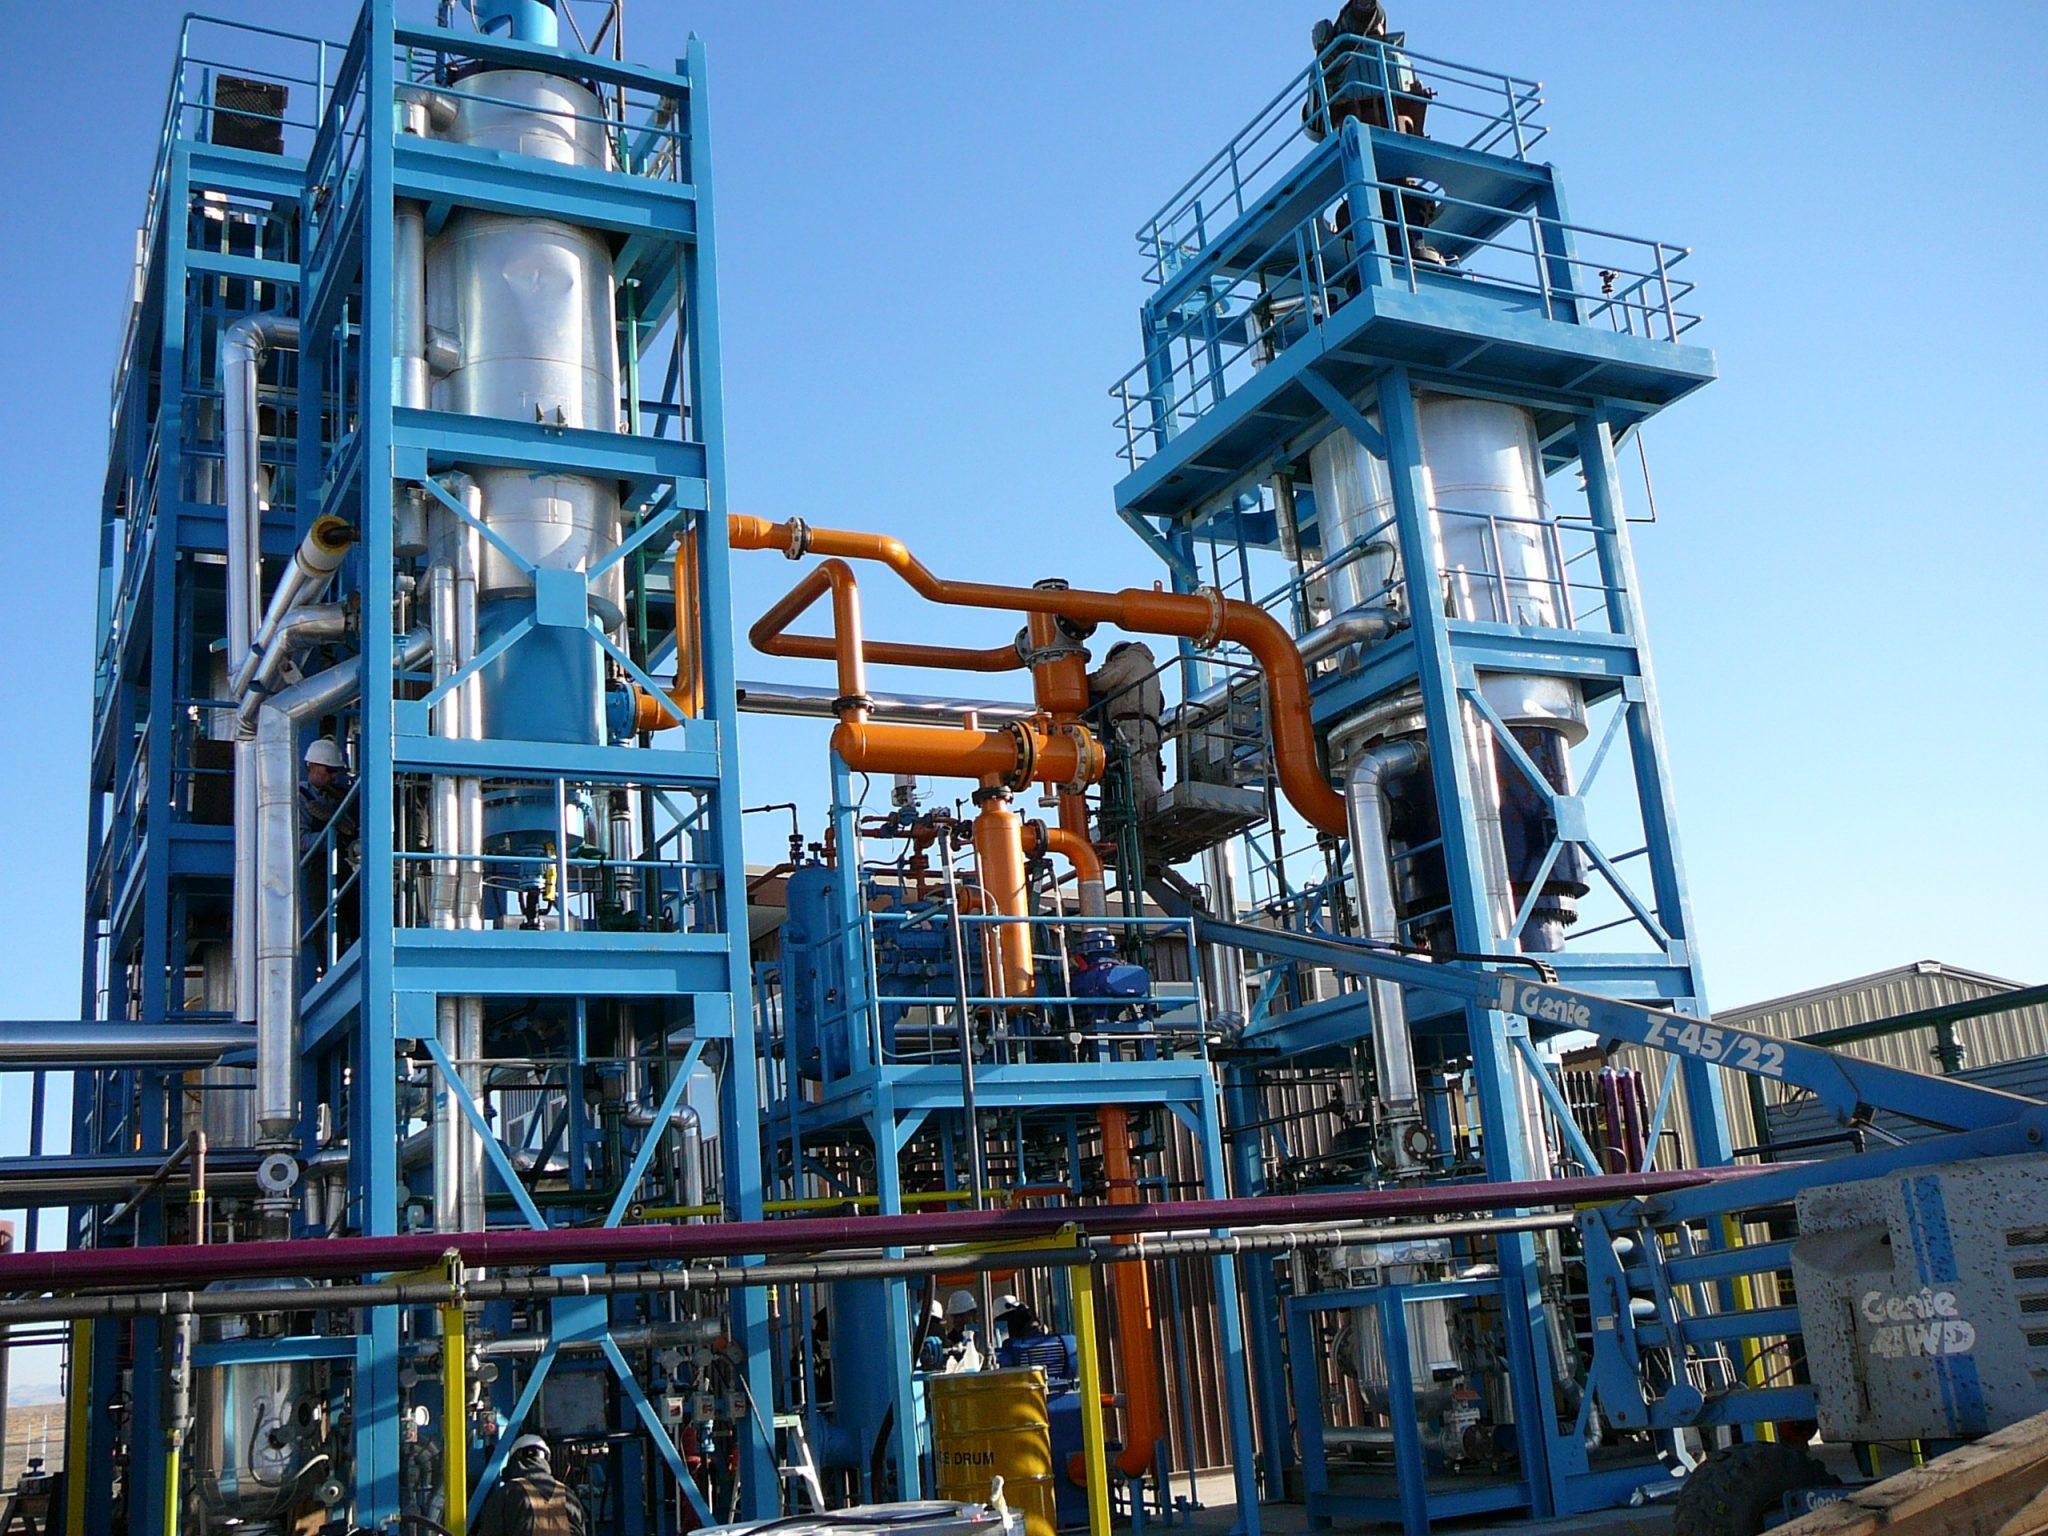 Oil recycling evaporator skids